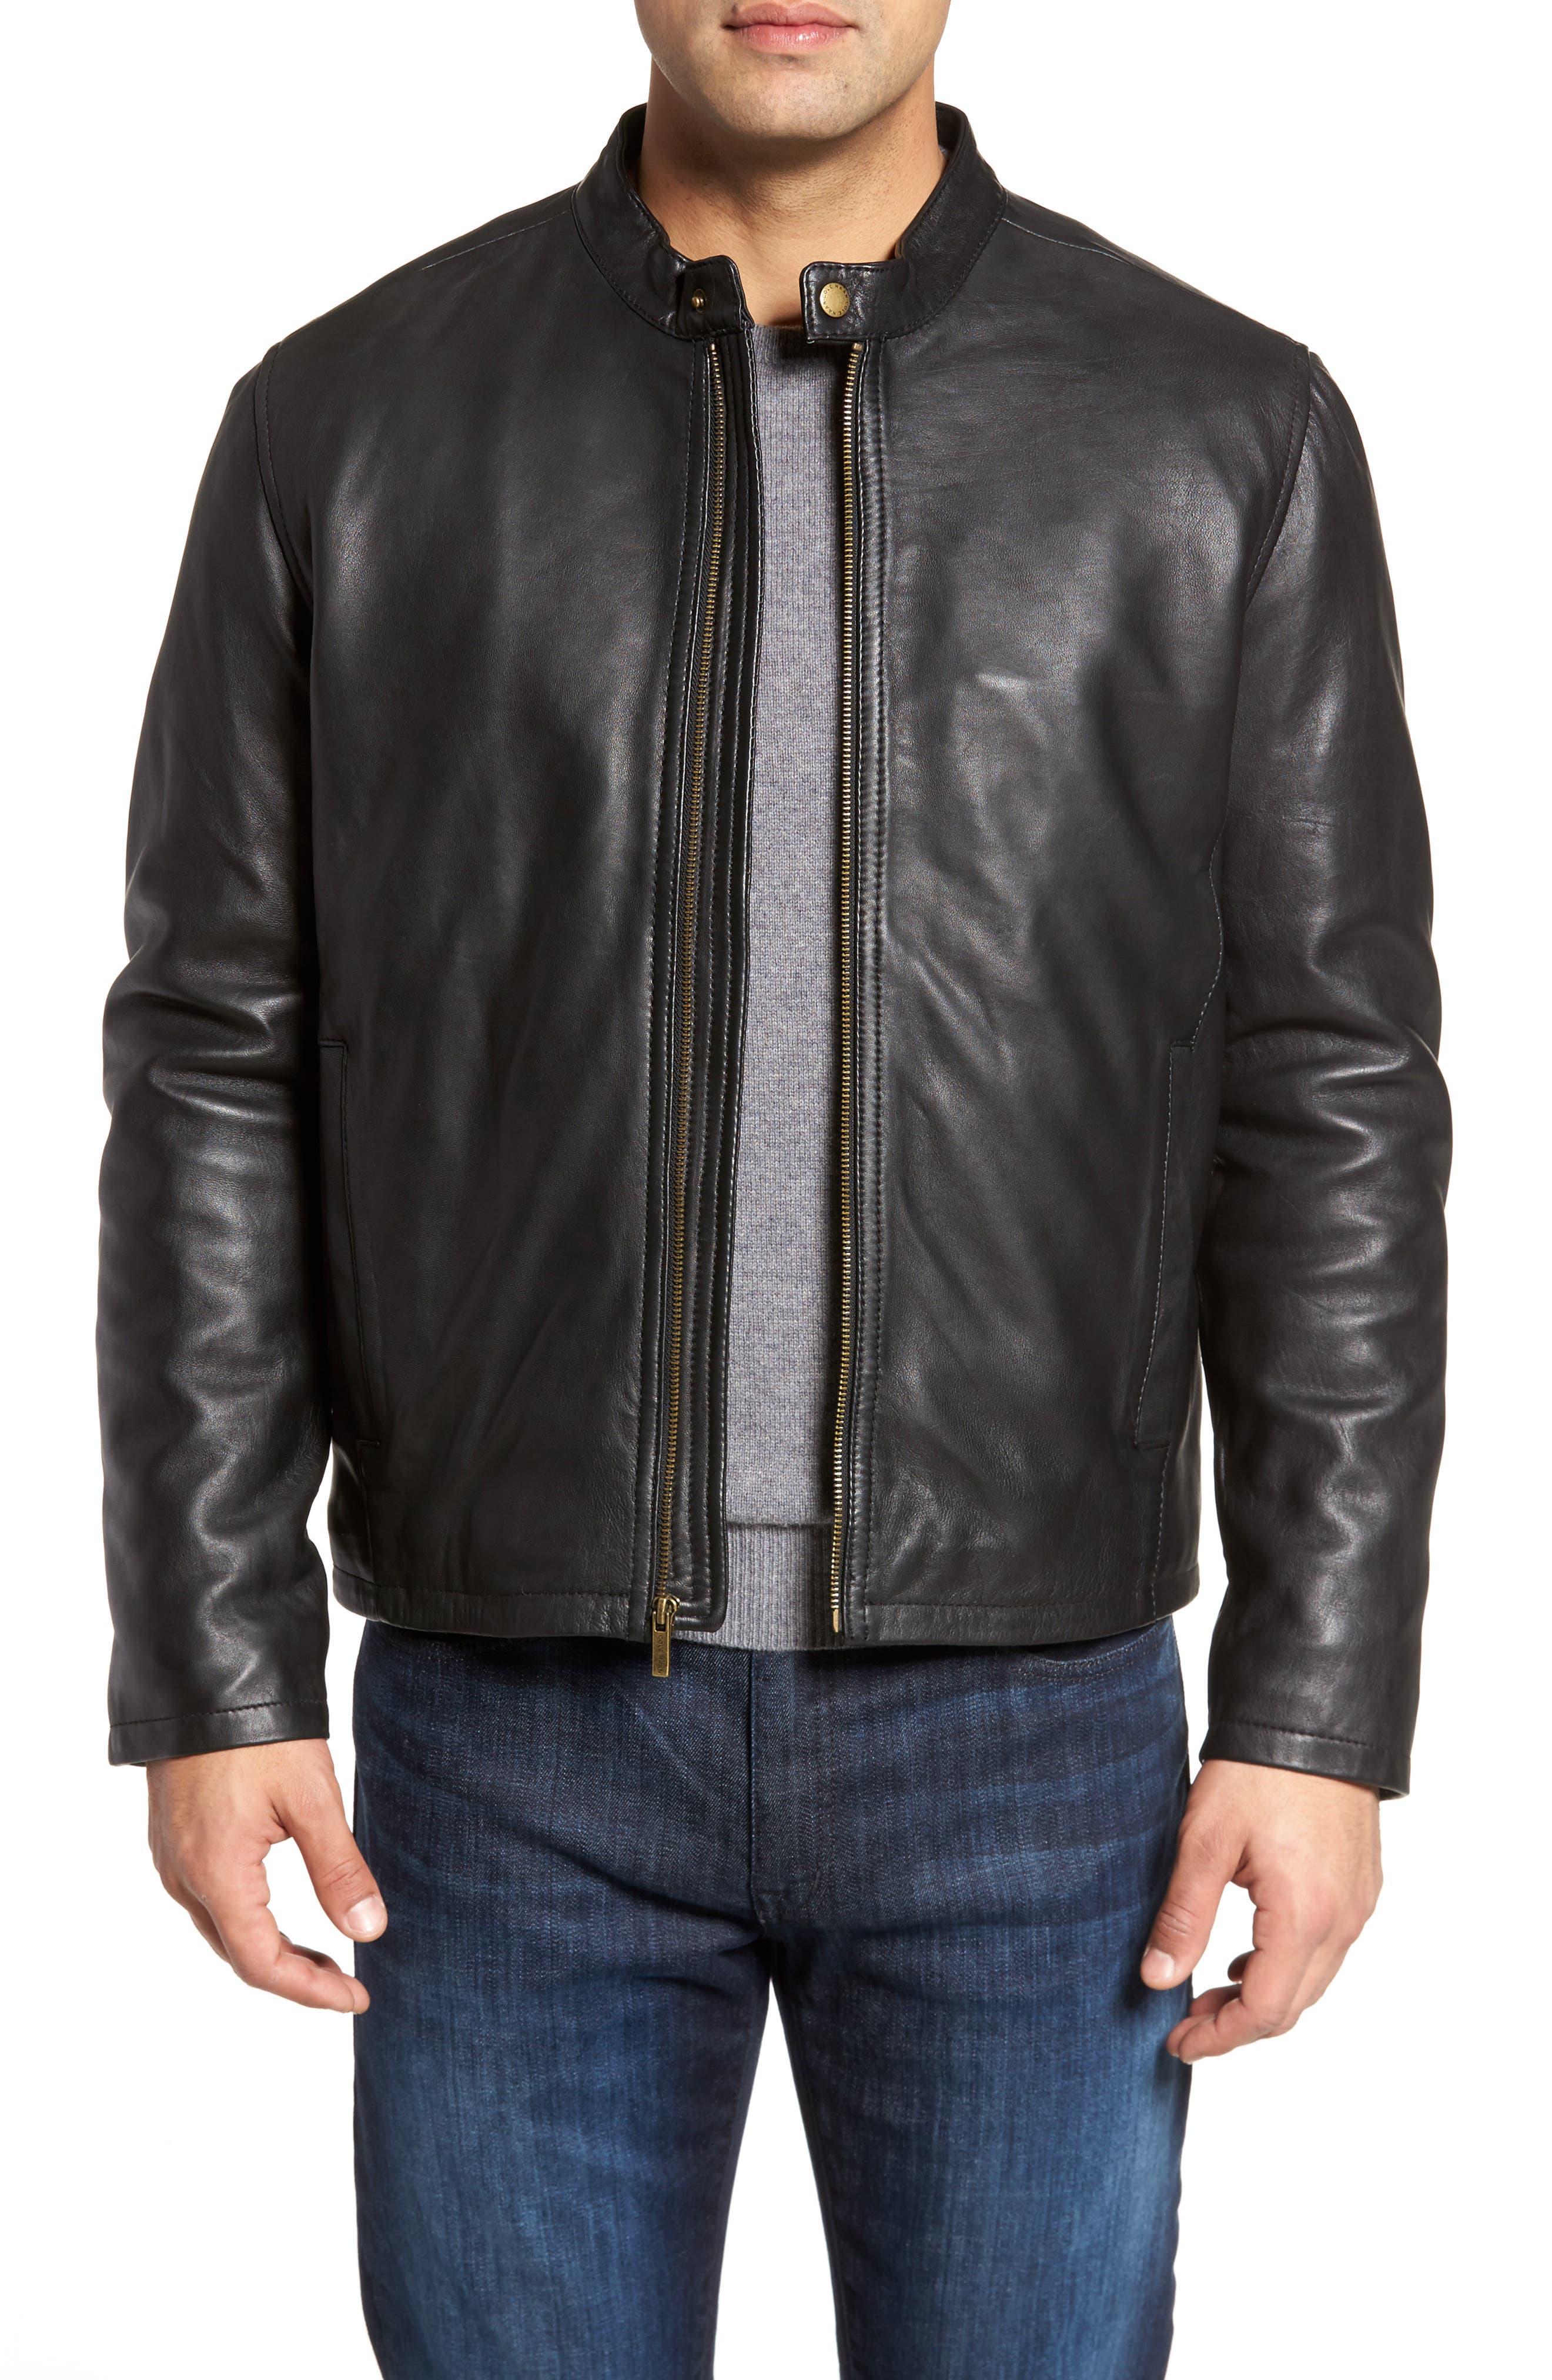 moto leather jacket mens. cole haan lambskin leather moto jacket mens nordstrom